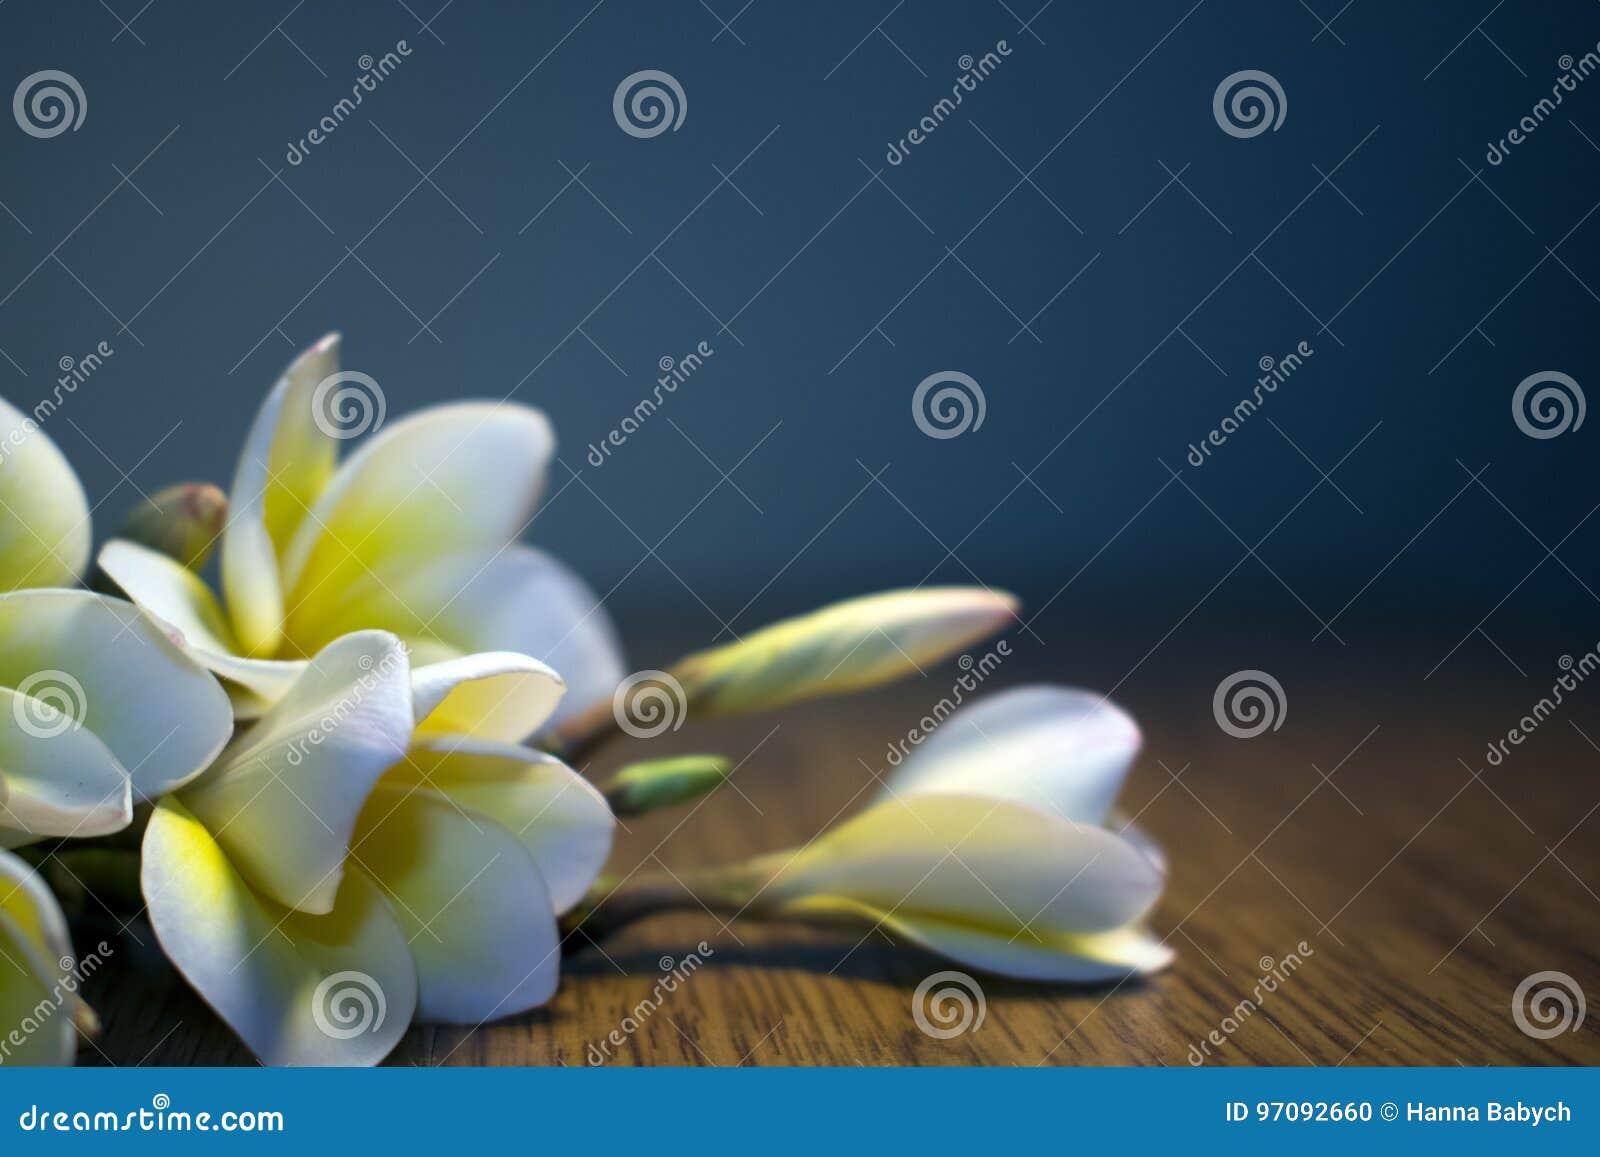 White Tropical Flowers Plumeria On A Dark Background Stock Photo